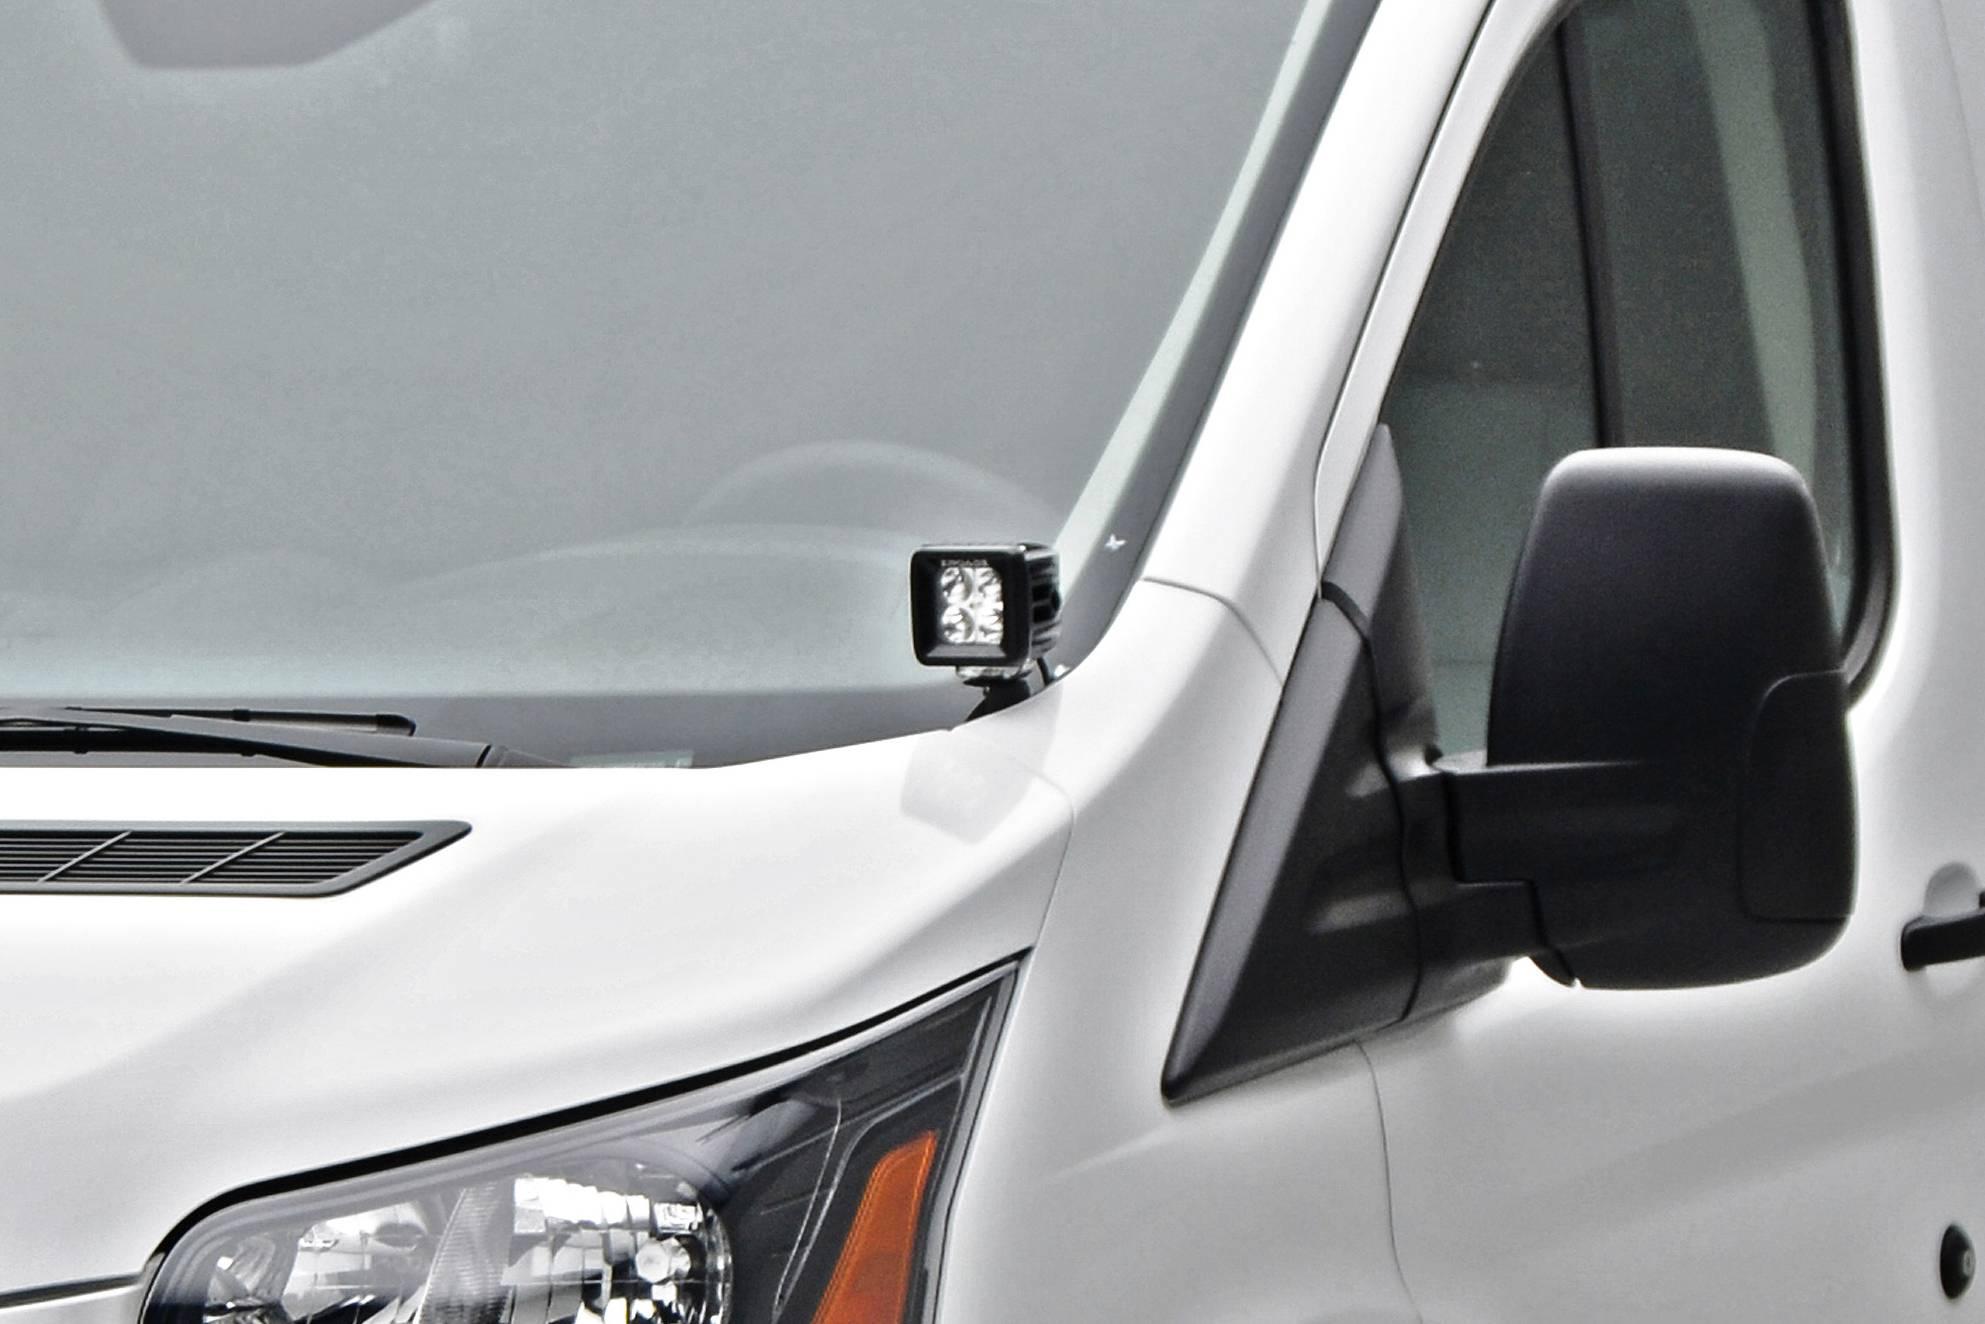 ZROADZ                                             - 2015-2018 Ford Transit Hood Hinge LED Kit with (2) 3 Inch LED Pod Lights - PN #Z365751-KIT2